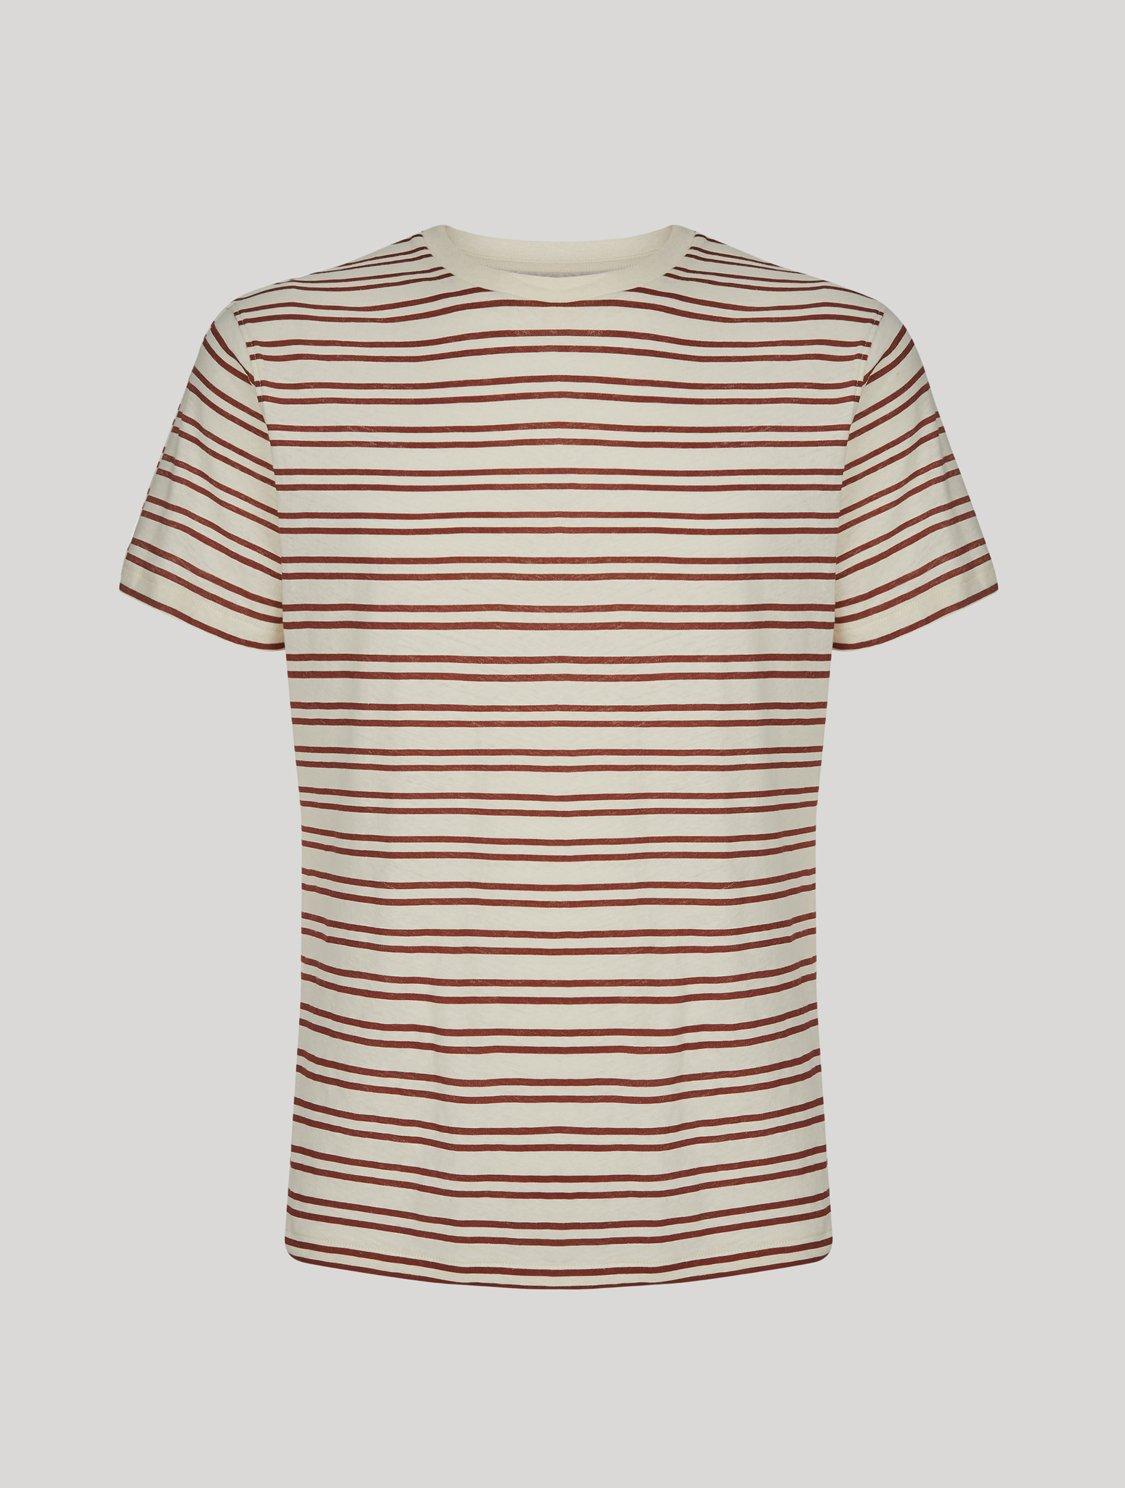 Lucio T-Shirt Leblon Stripe Print Bordeaux XXXL